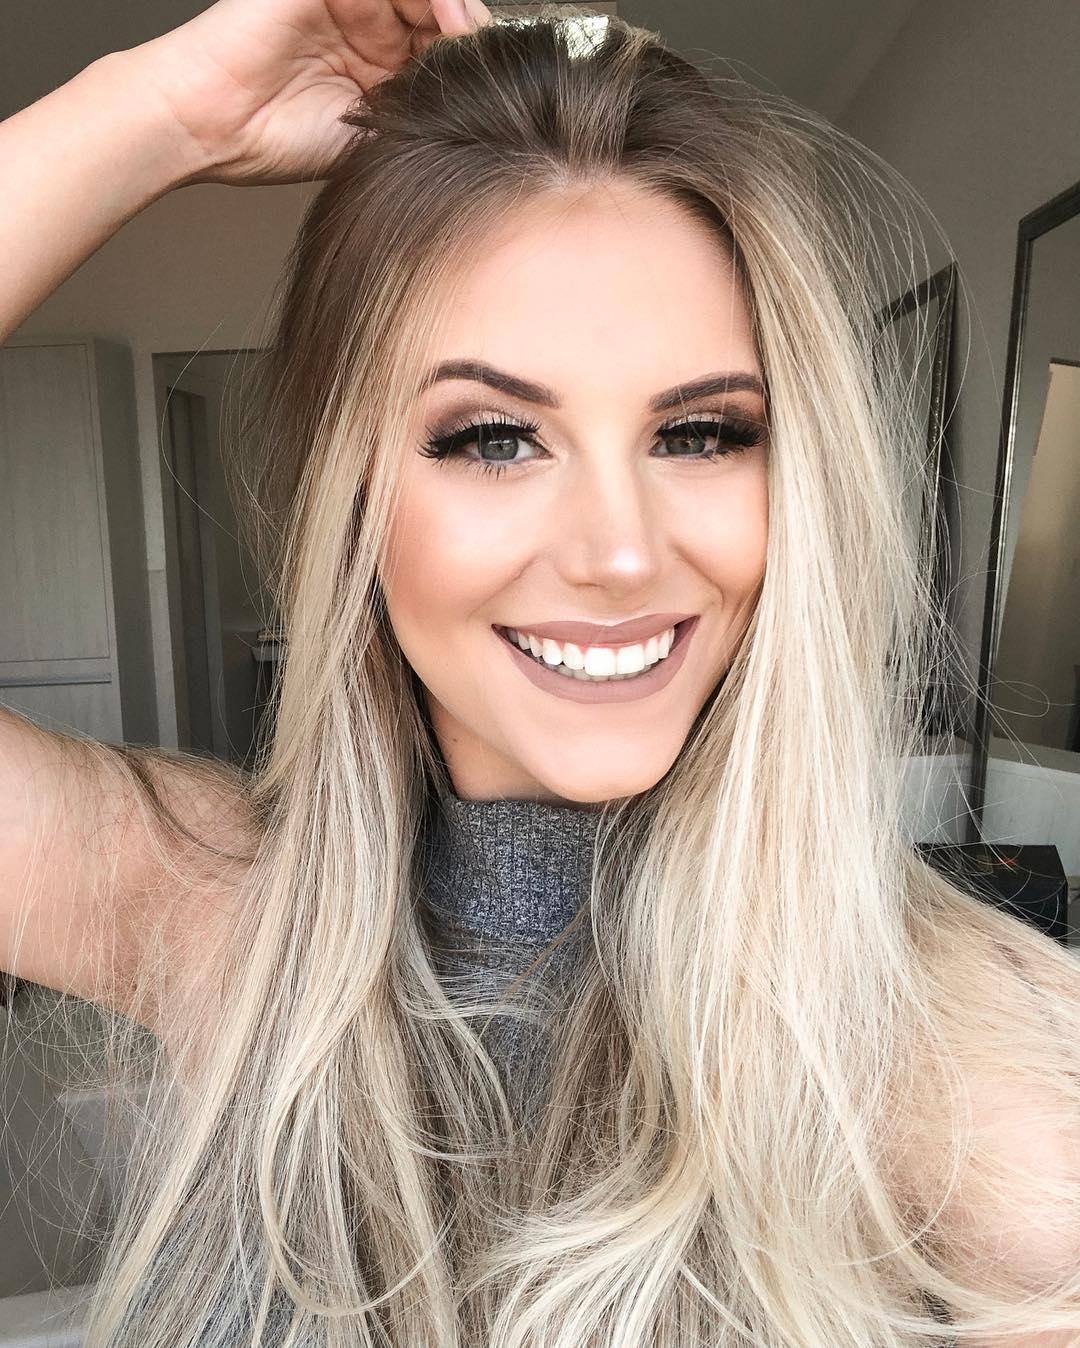 amanda pegoraro , miss brasil de las americas 2019. - Página 2 49484212